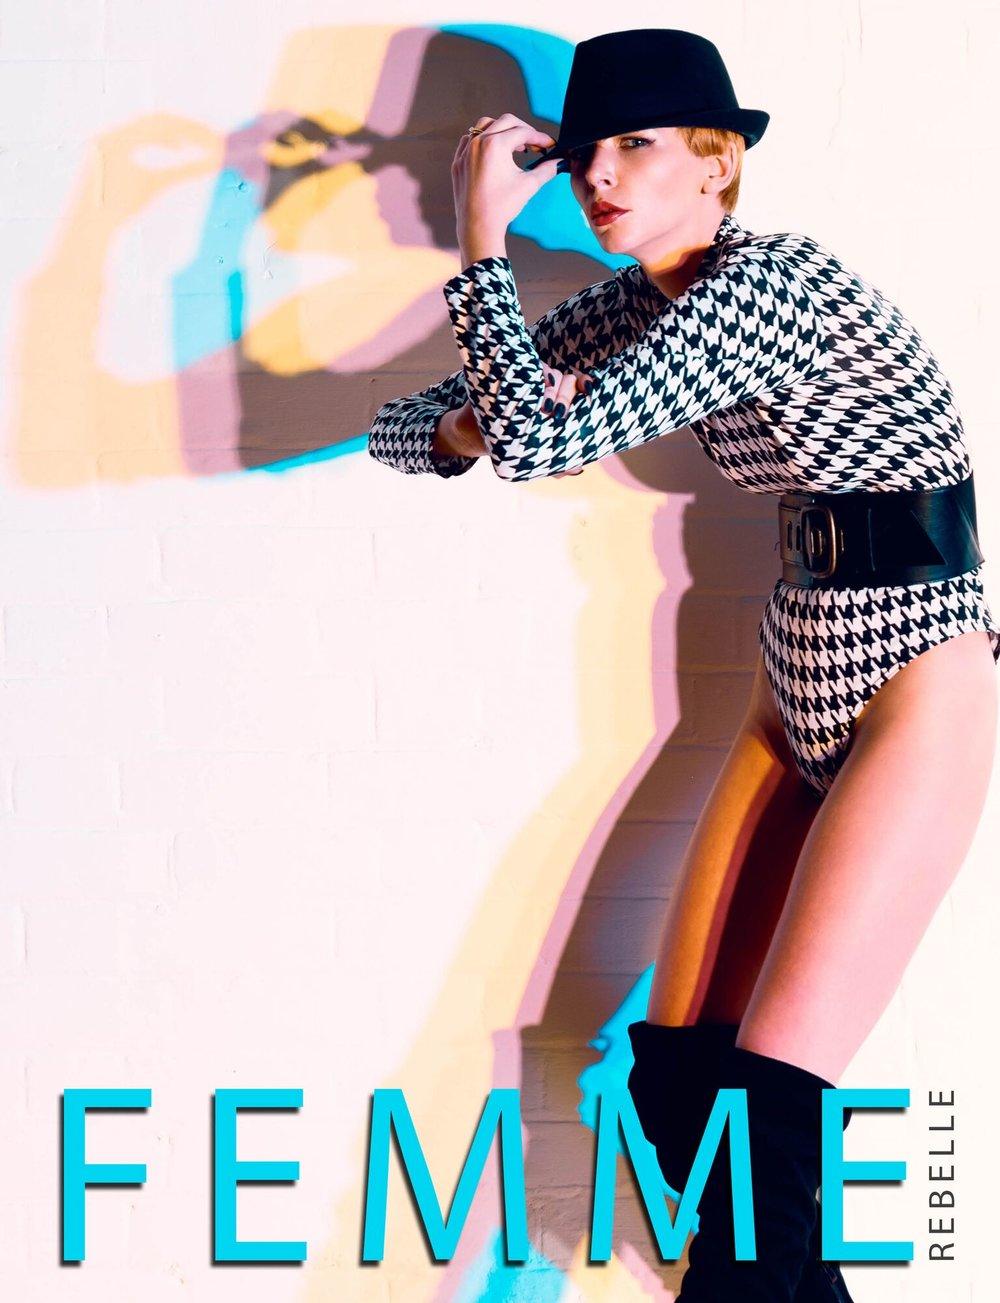 Femme Rebelle December BOOK 2 Cover 1_preview.jpeg